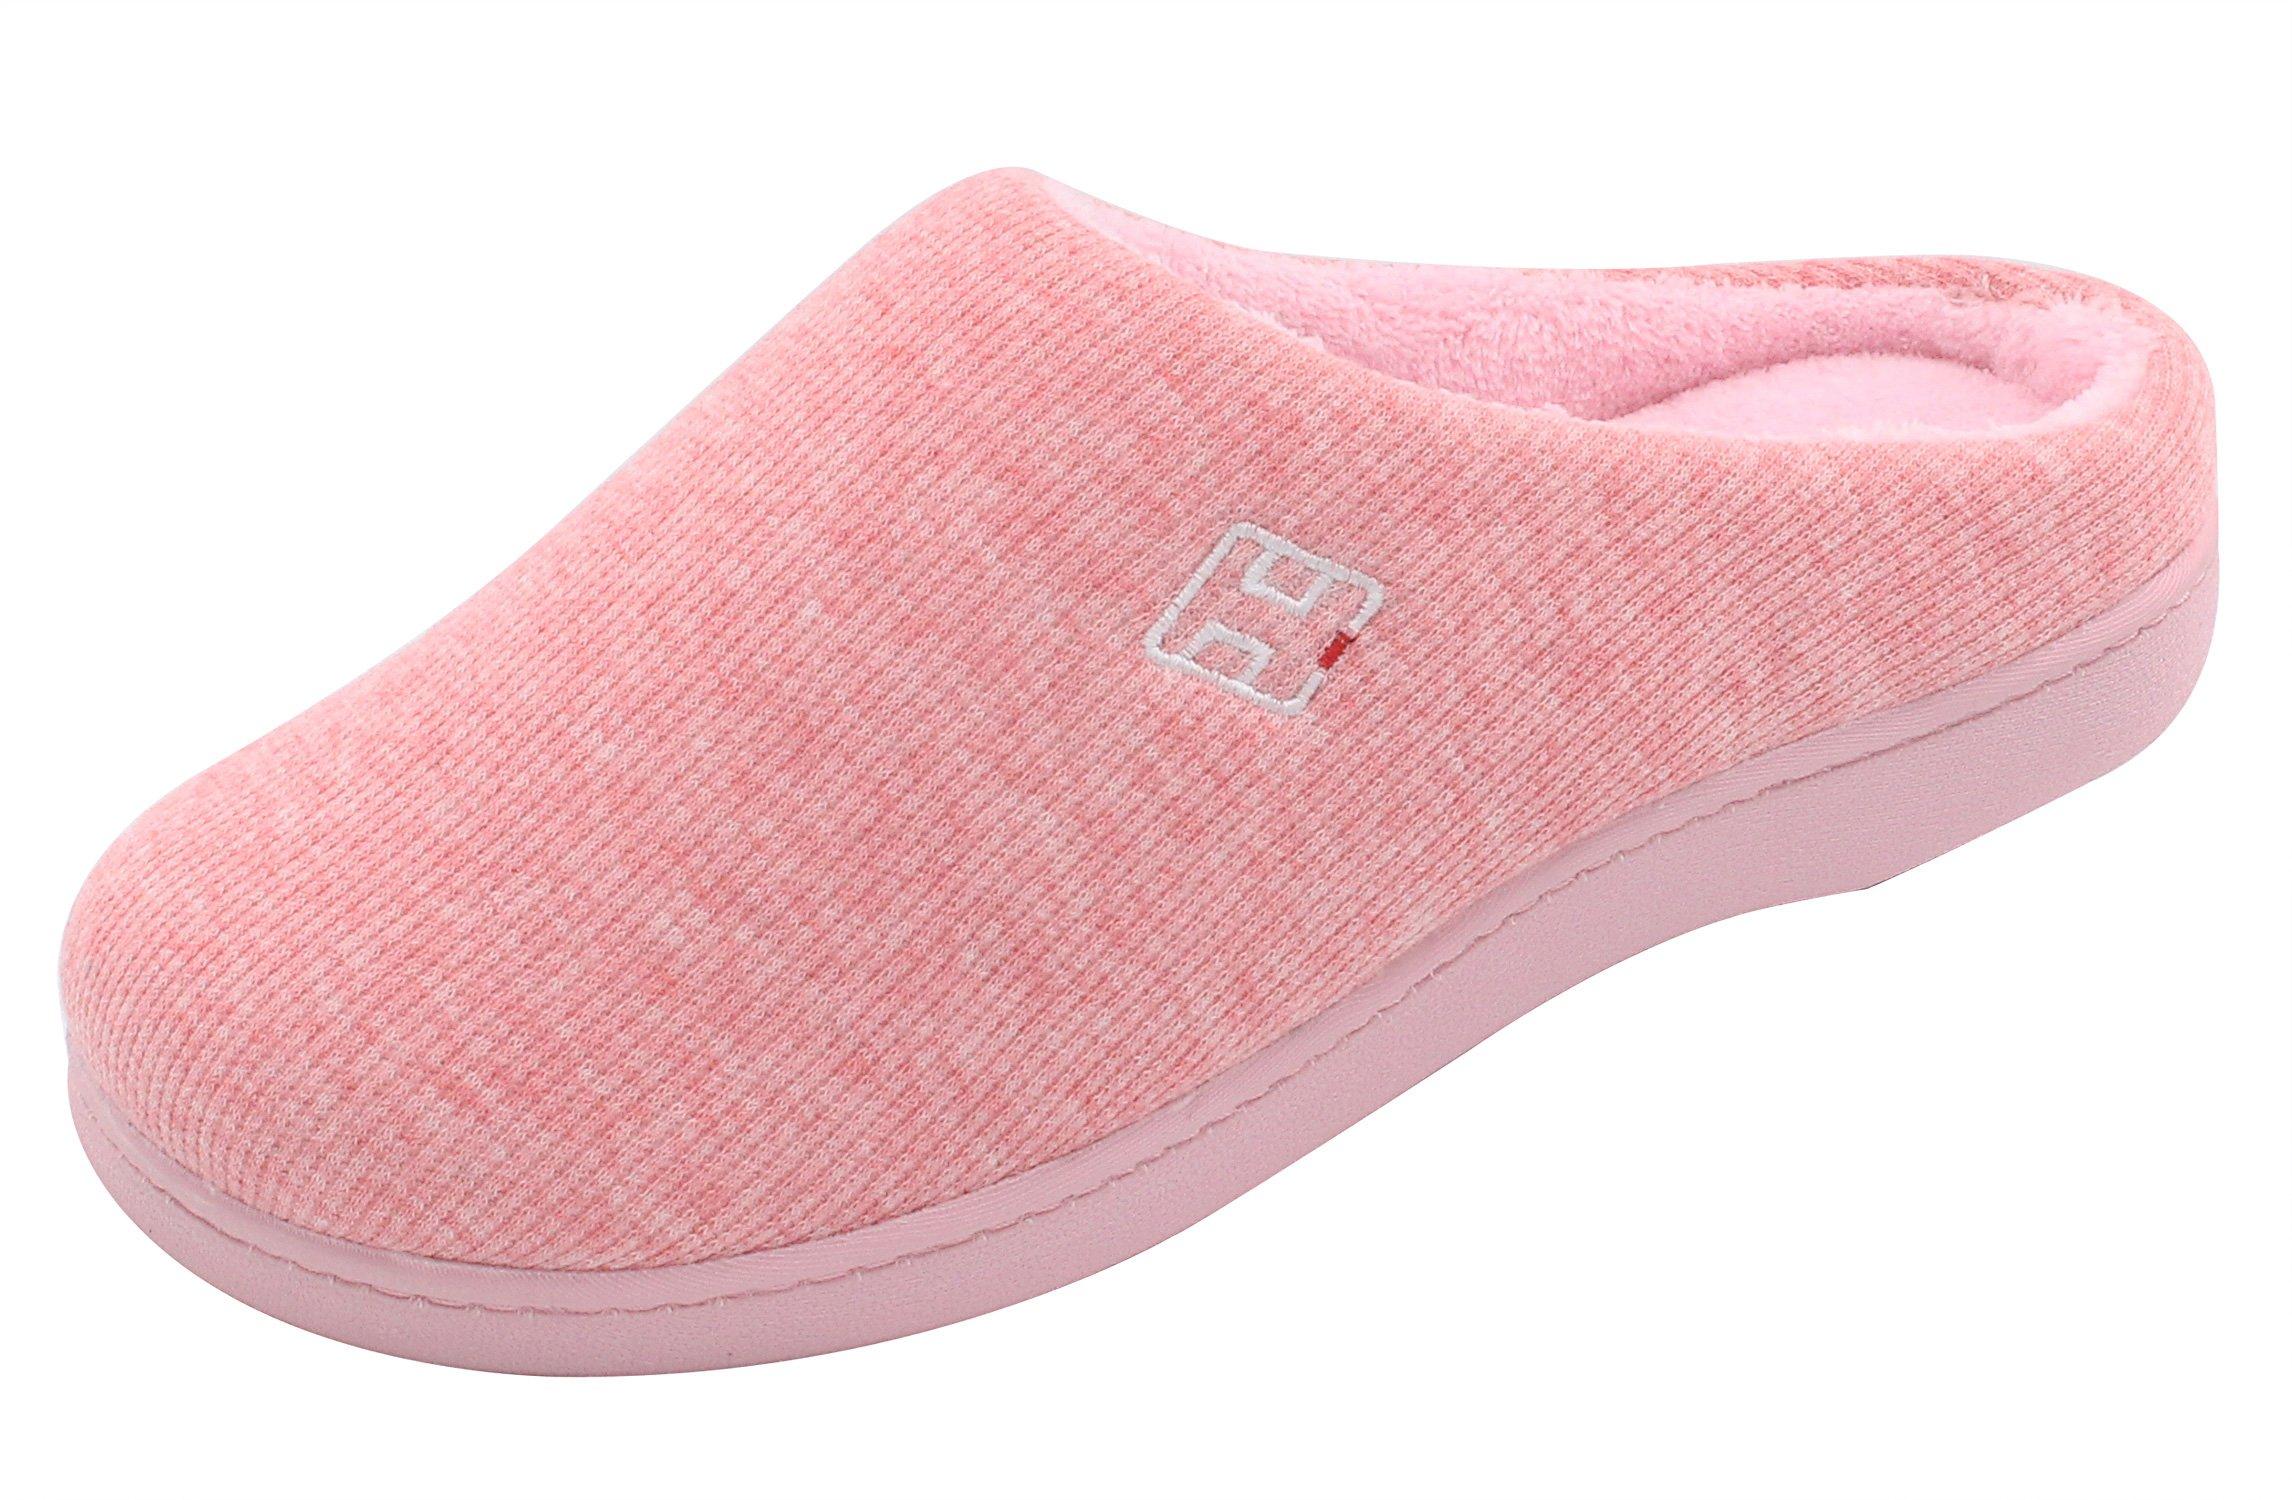 HomeIdeas Women's Classic Memory Foam Plush House Slippers, Lightweight and Anti-Slip (Medium / 7-8 B(M) US, Pink)